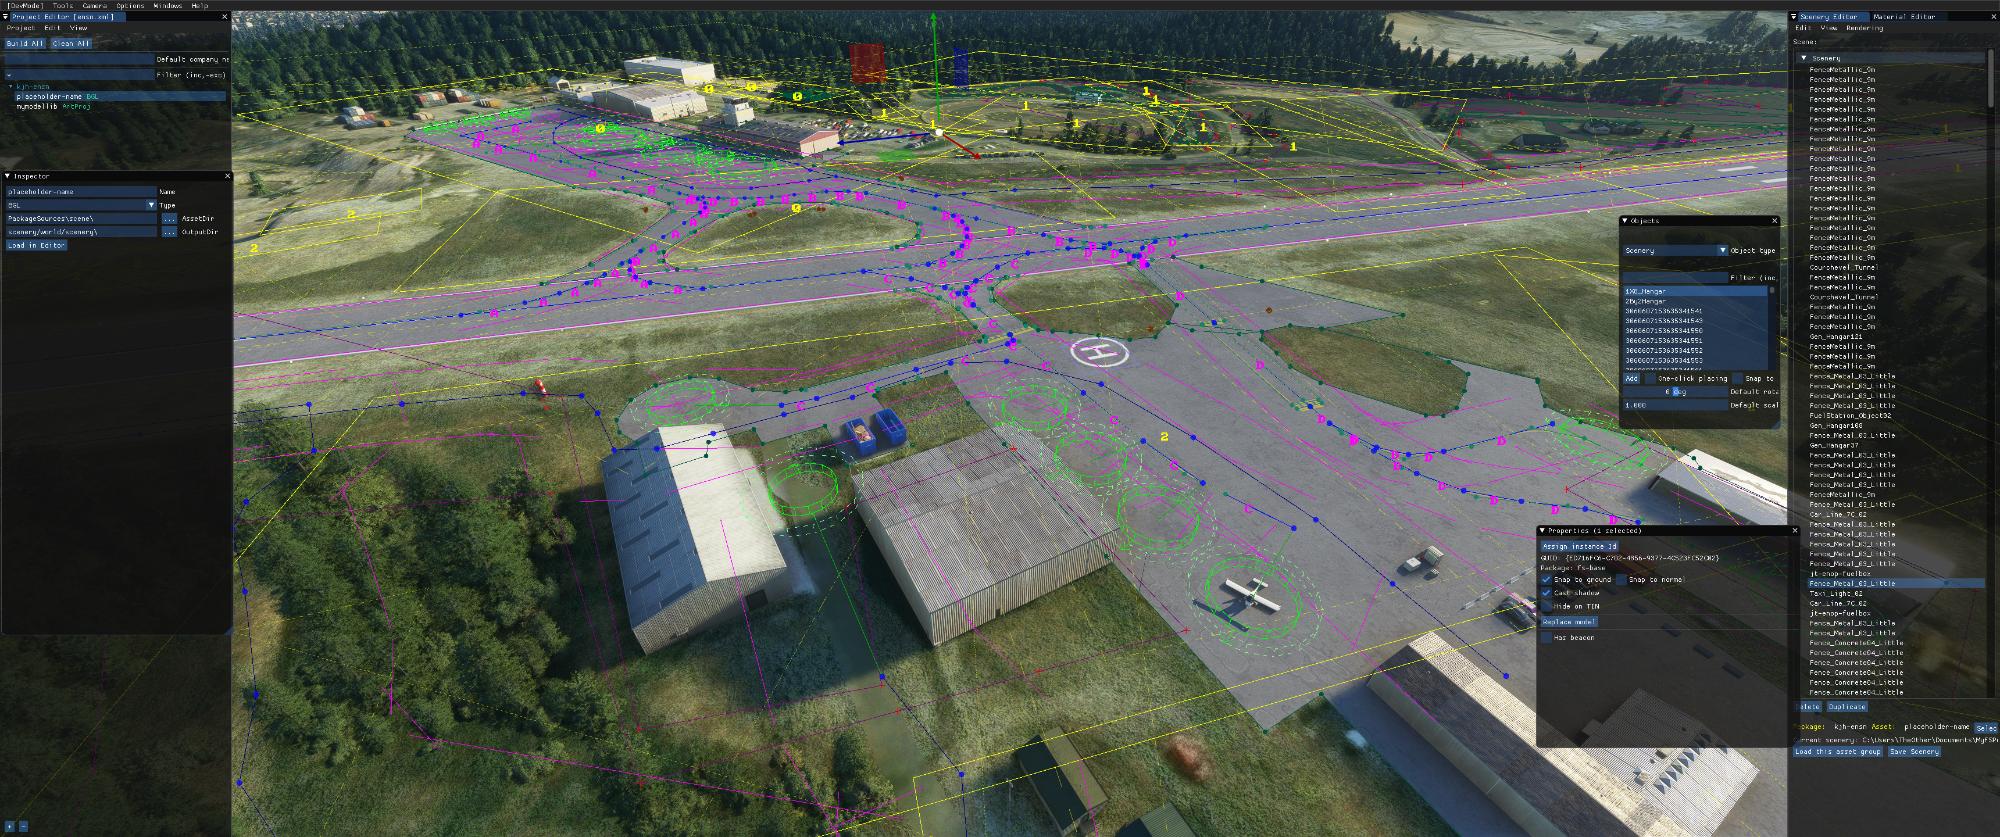 Microsoft Flight Simulator Screenshot 2020.11.04 - 22.50.00.48.png